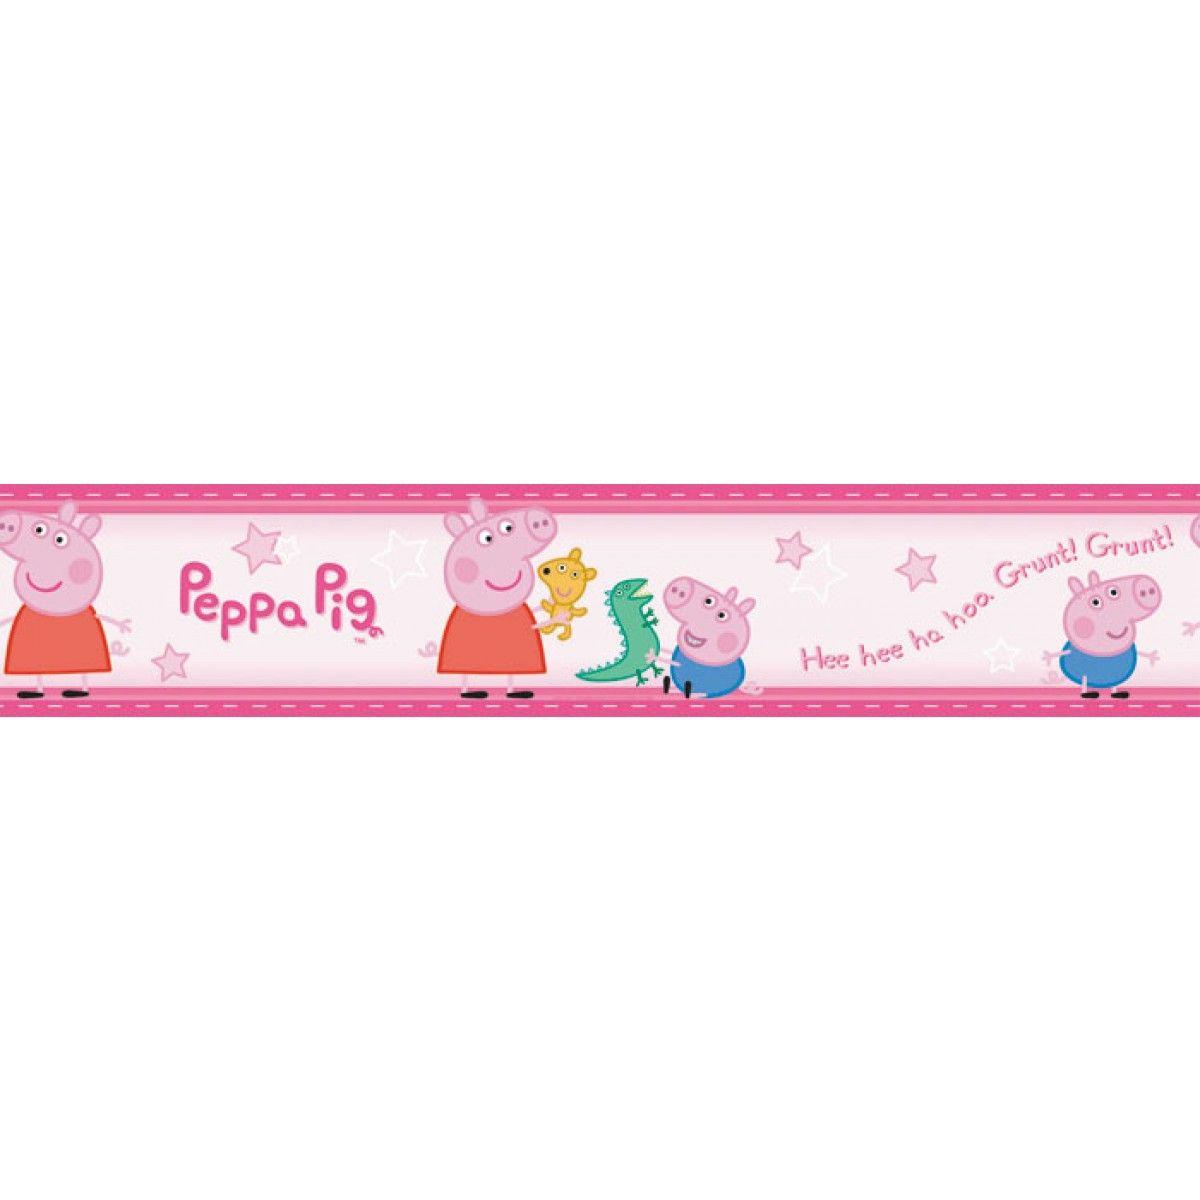 Peppa Pig George Wallpaper Border Self Adhesive 5m Peppa Pig Peppa Wallpaper